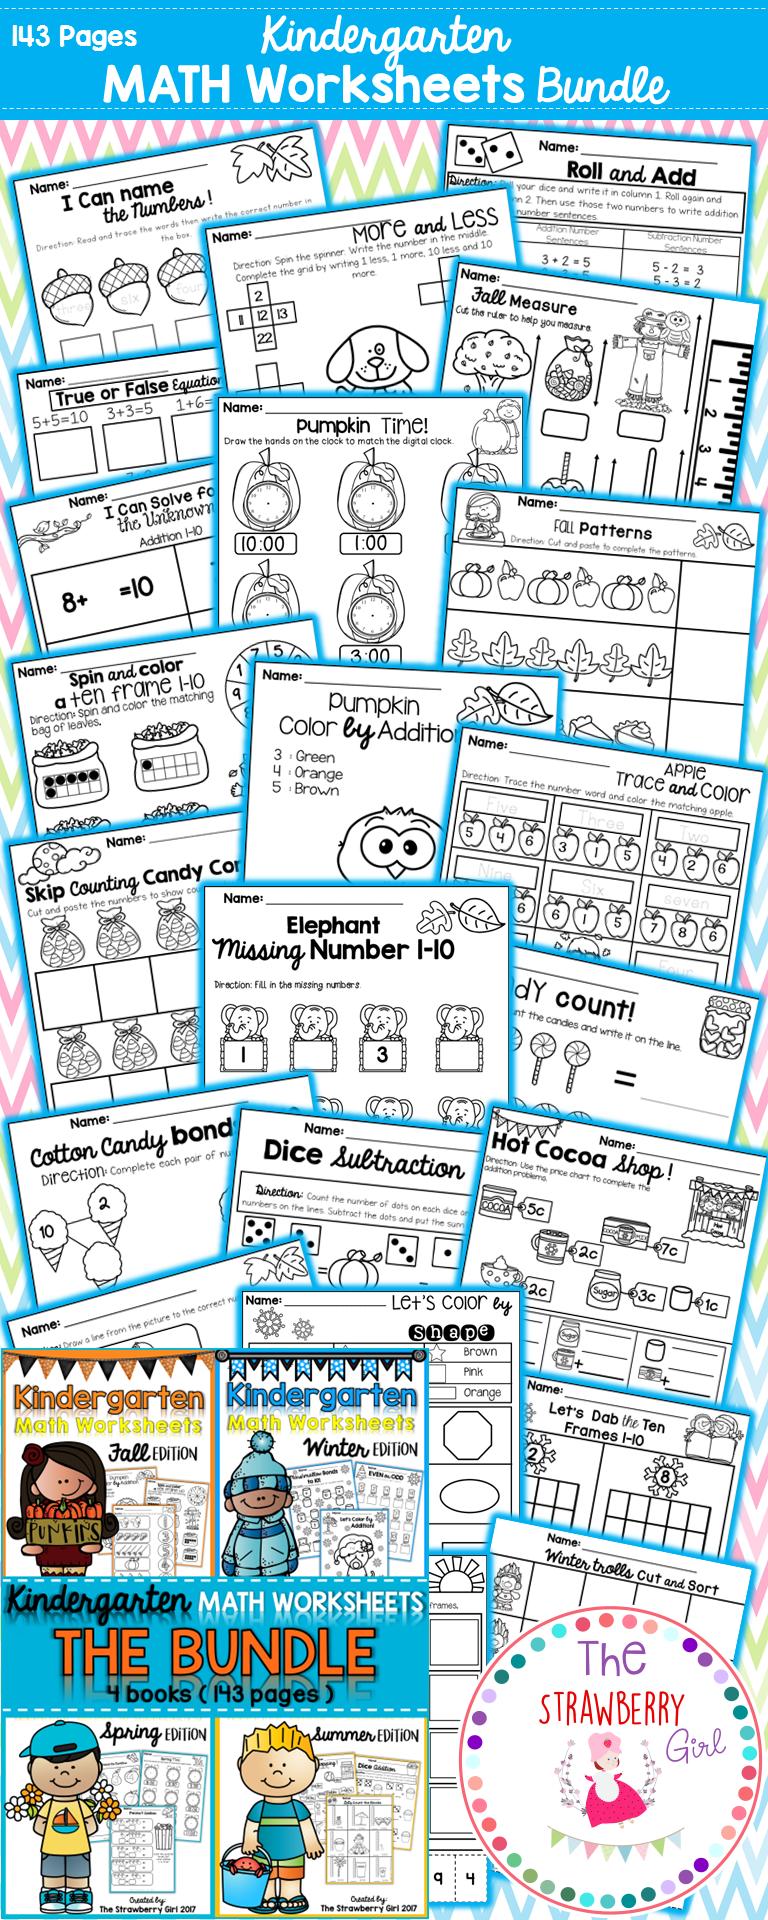 Kindergarten Math Worksheets - Bundle | Fun worksheets, Math ...